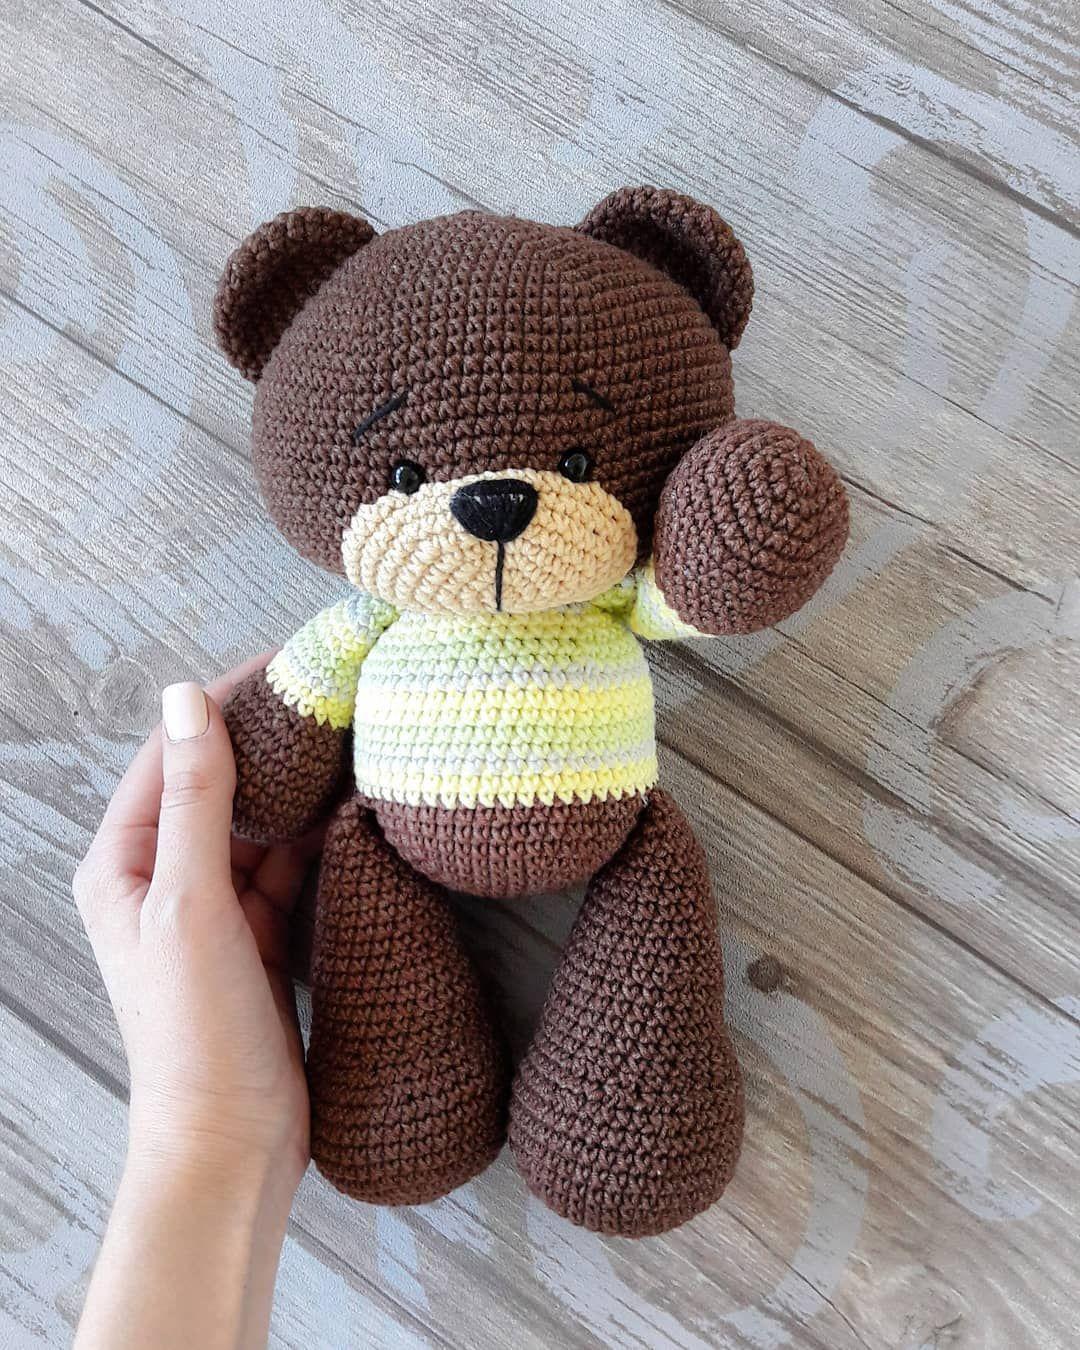 Love this sweet travelling doll crochet amigurumi pattern